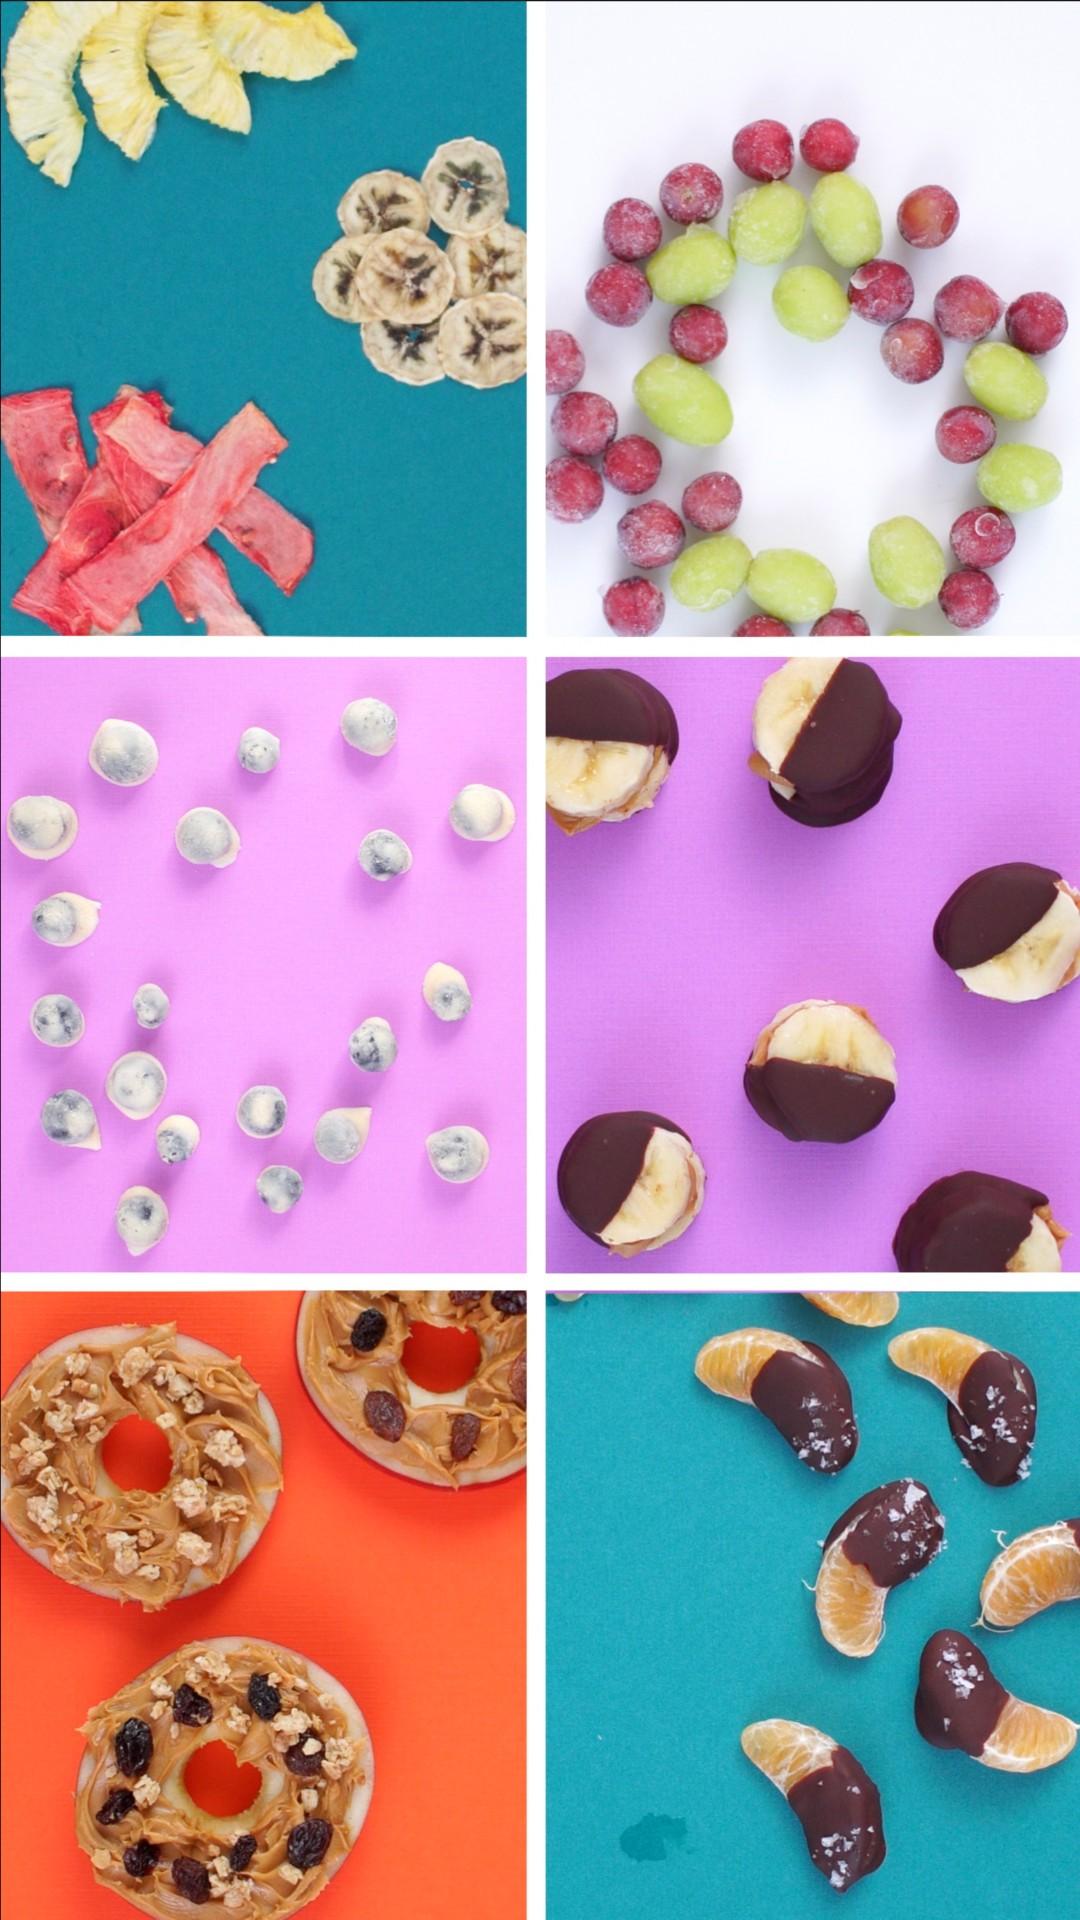 6 Easy, Healthy-ish Summer Snacks